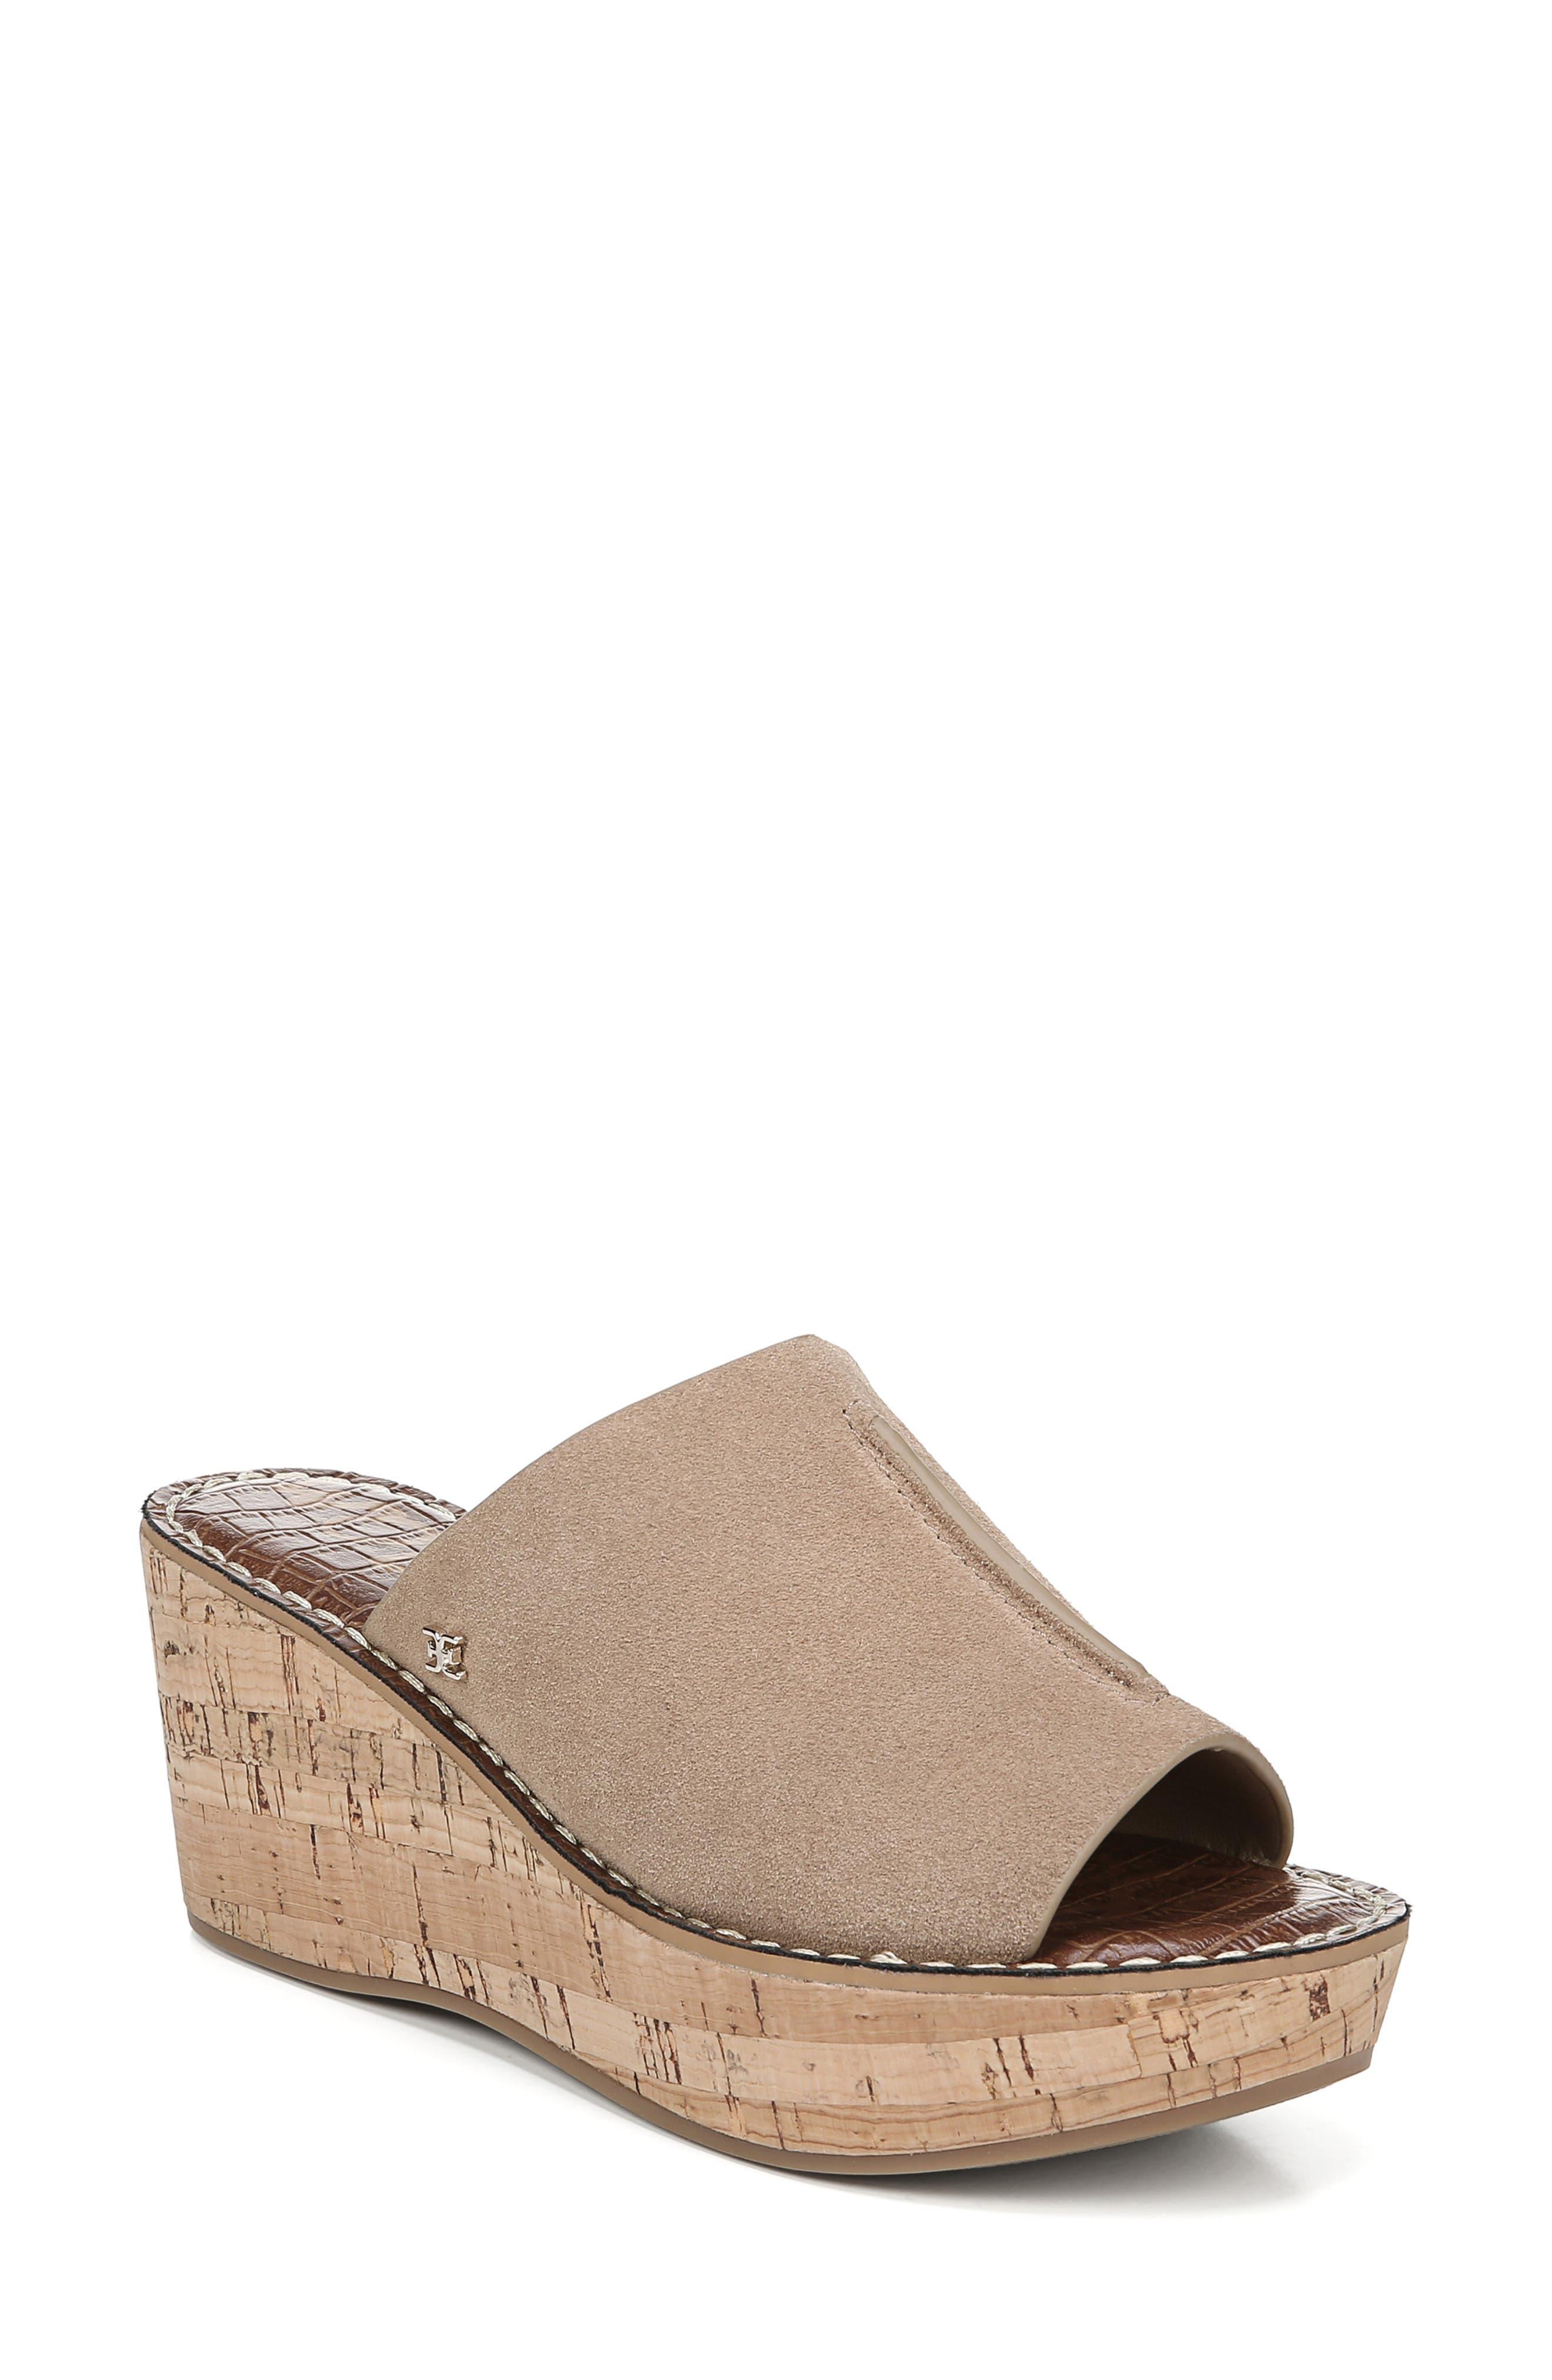 5c30f015b6b4 Wedges Sam Edelman Shoes